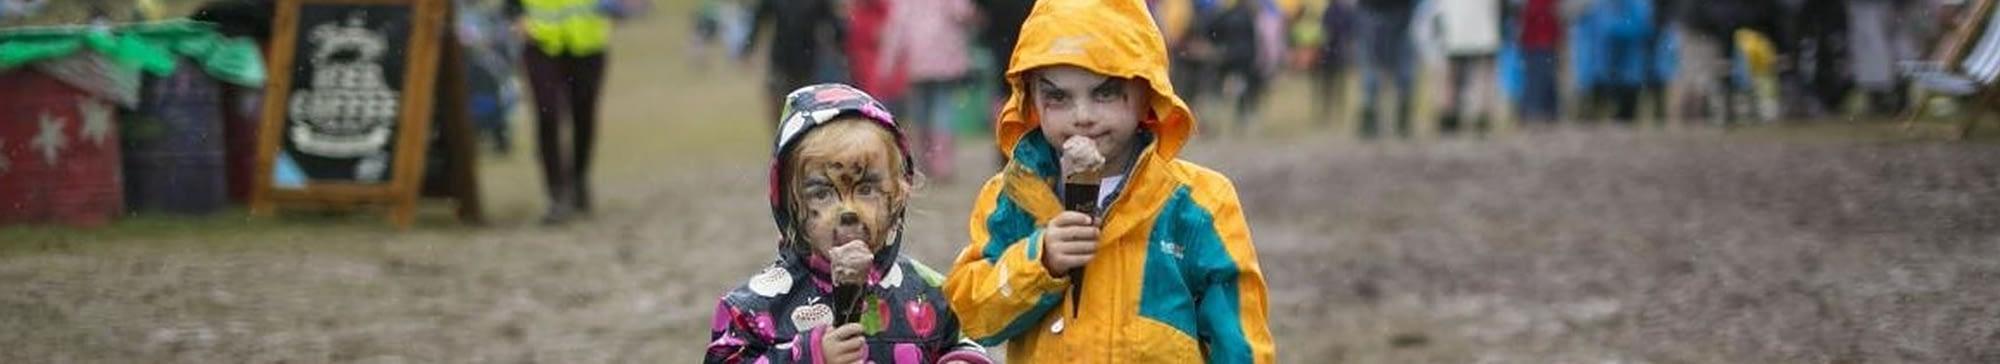 Children Enjoying Purbeck Ice Cream